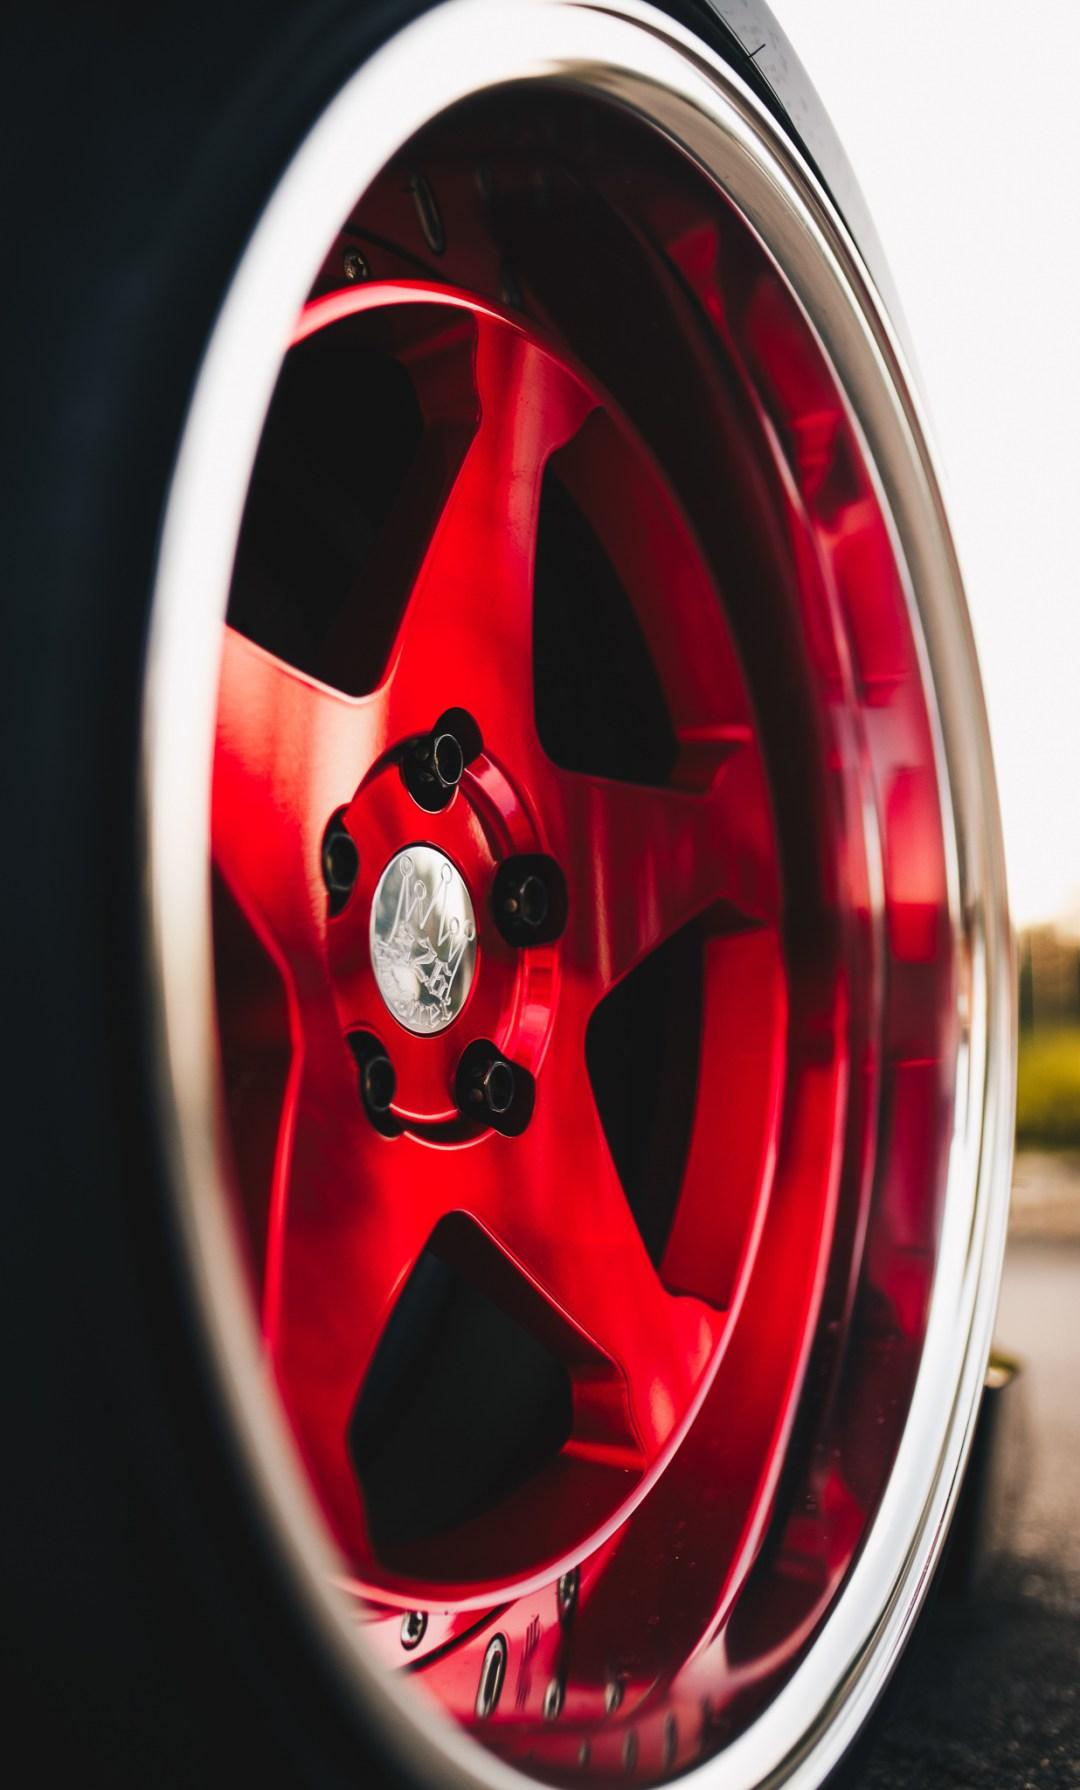 326 Power wheels